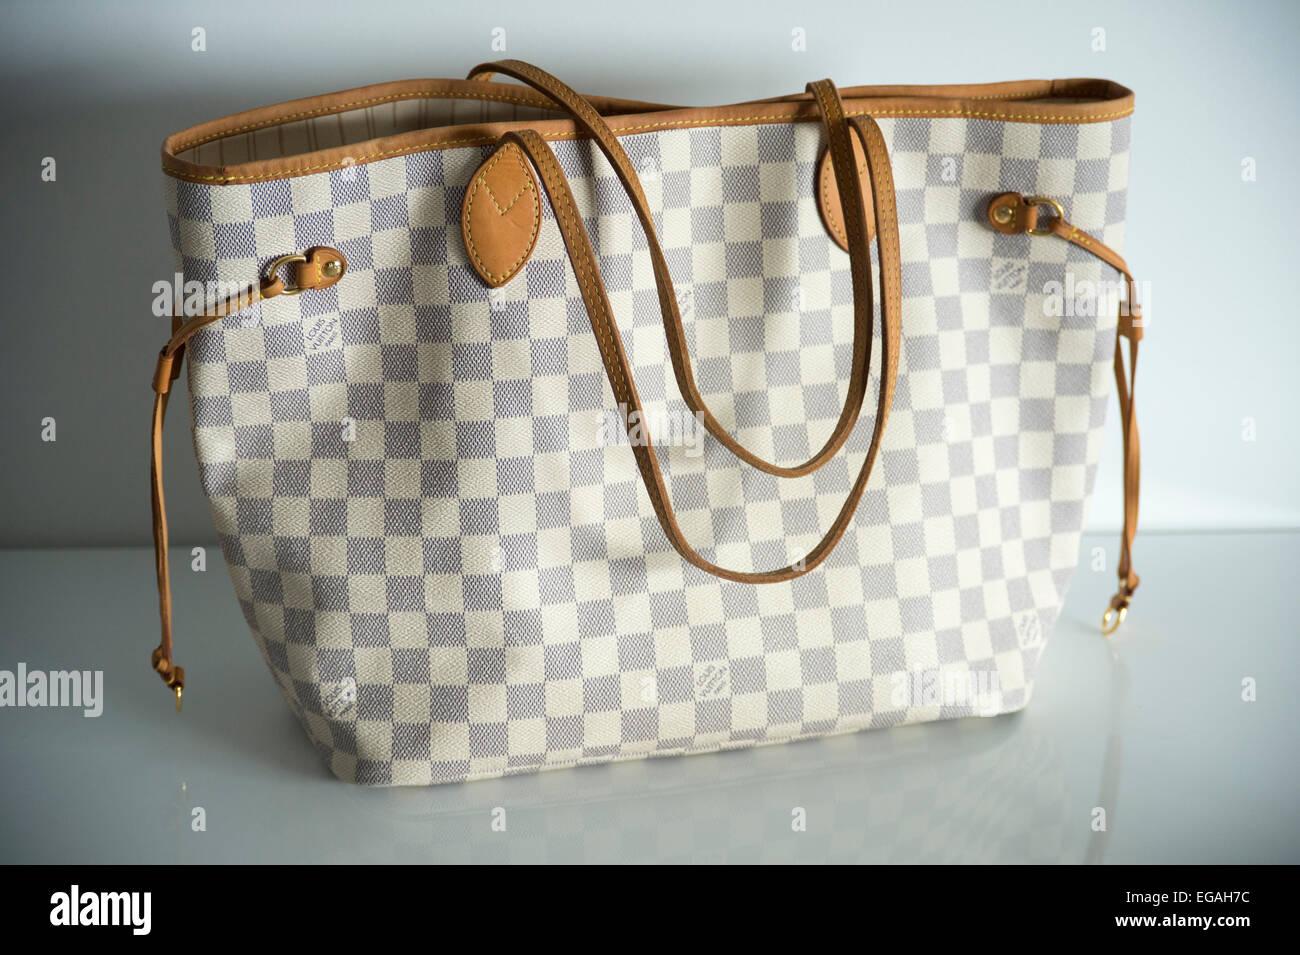 3e656436e Louis Vuitton Luggage Stock Photos & Louis Vuitton Luggage Stock ...